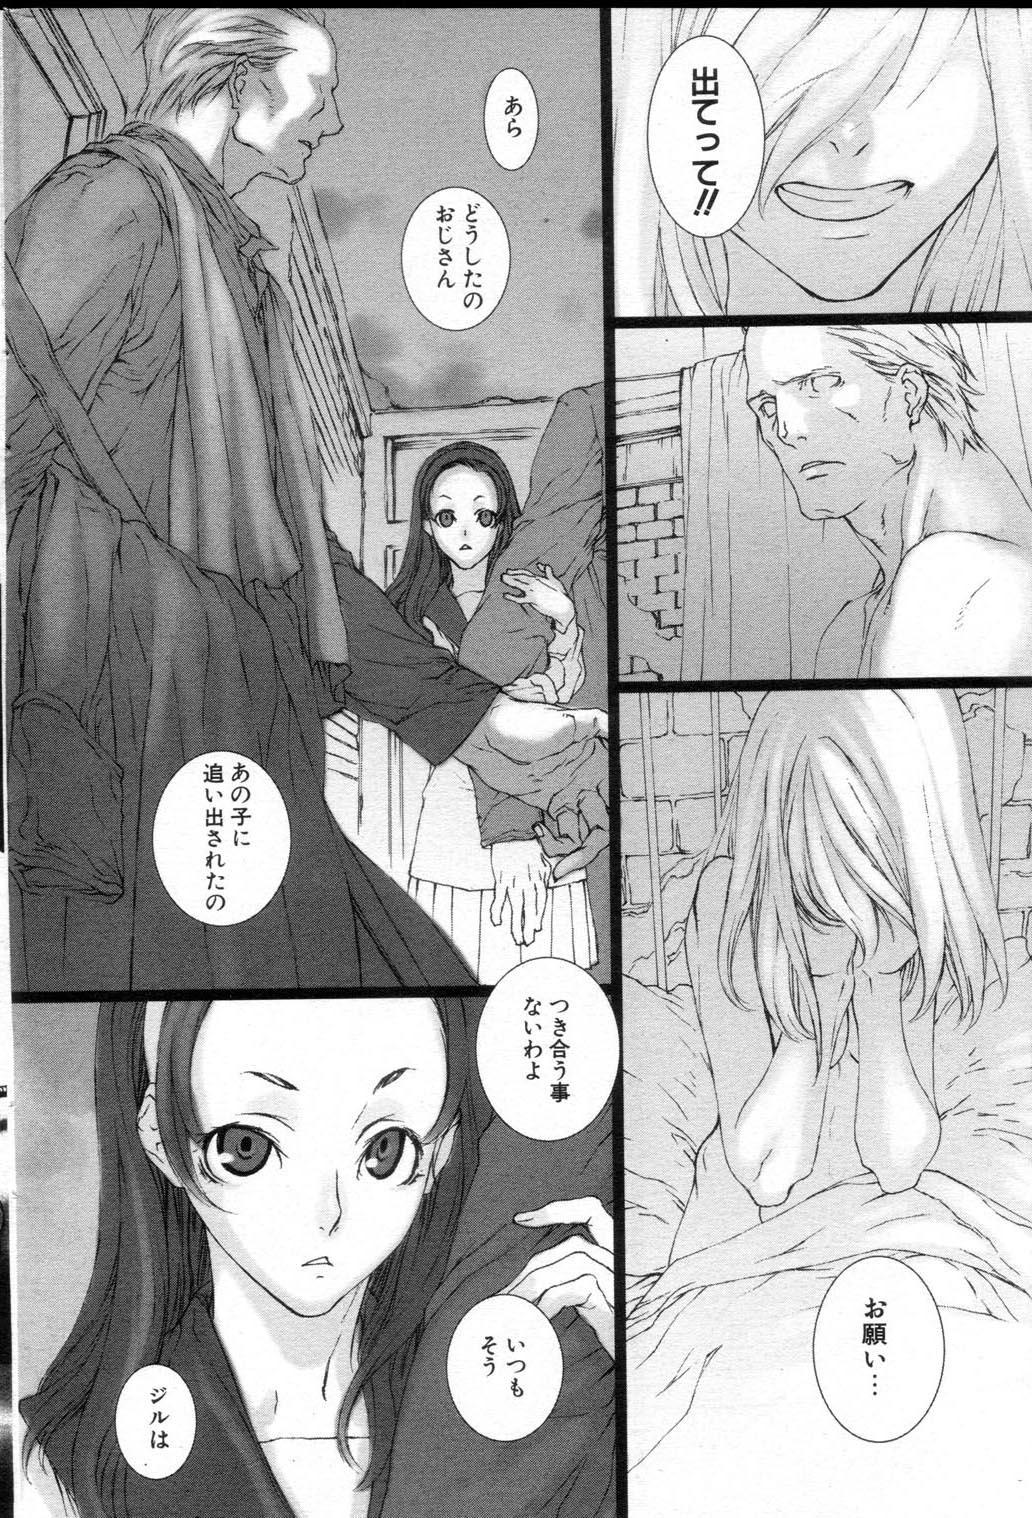 [Saiki Keita] FAIRY GONE GARDEN (Part Two) Kouhen 17